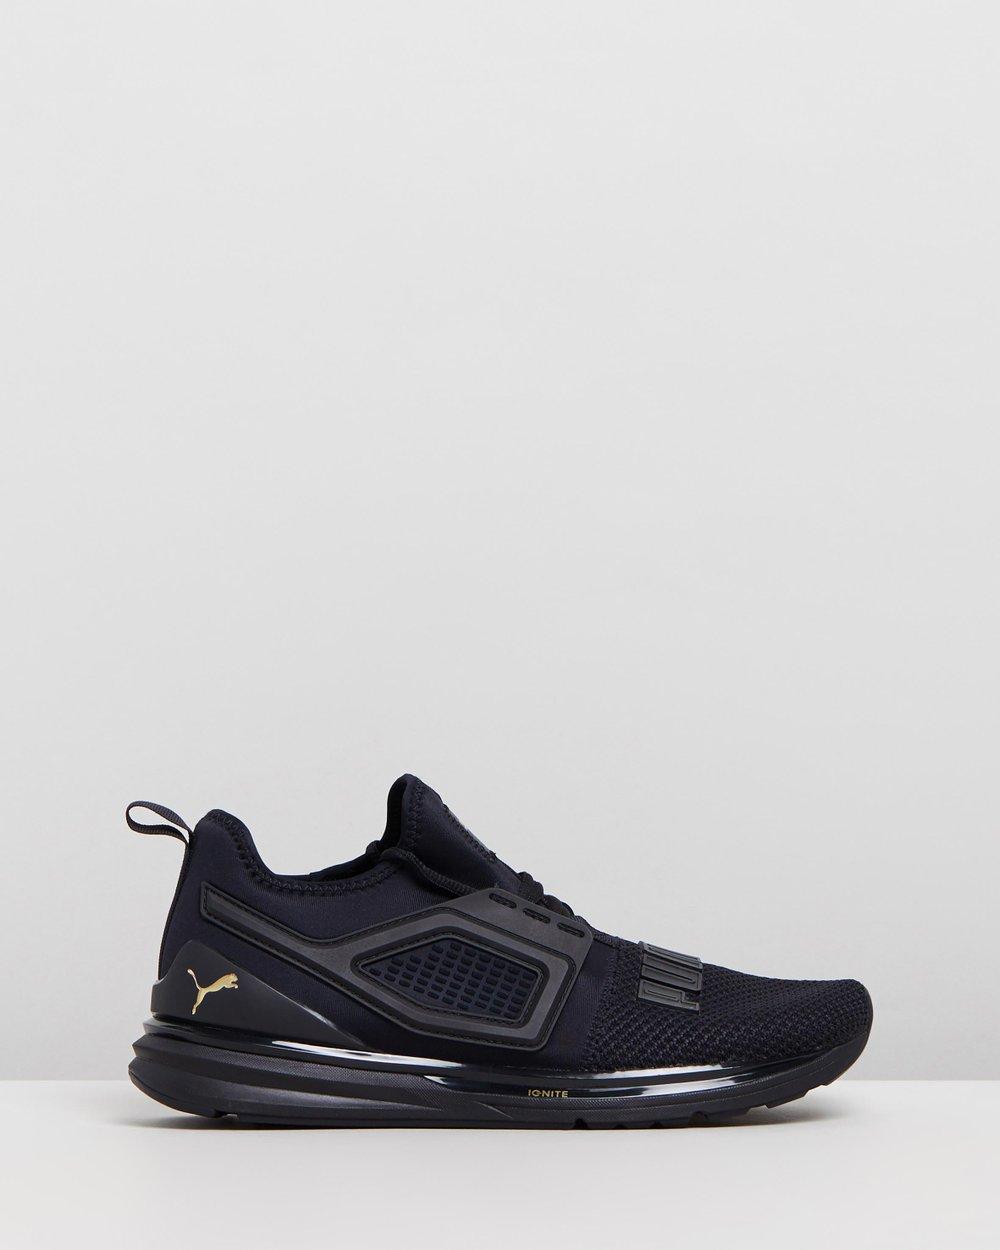 59d369f32d1d IGNITE Limitless 2 Running Shoes - Men s by Puma Online